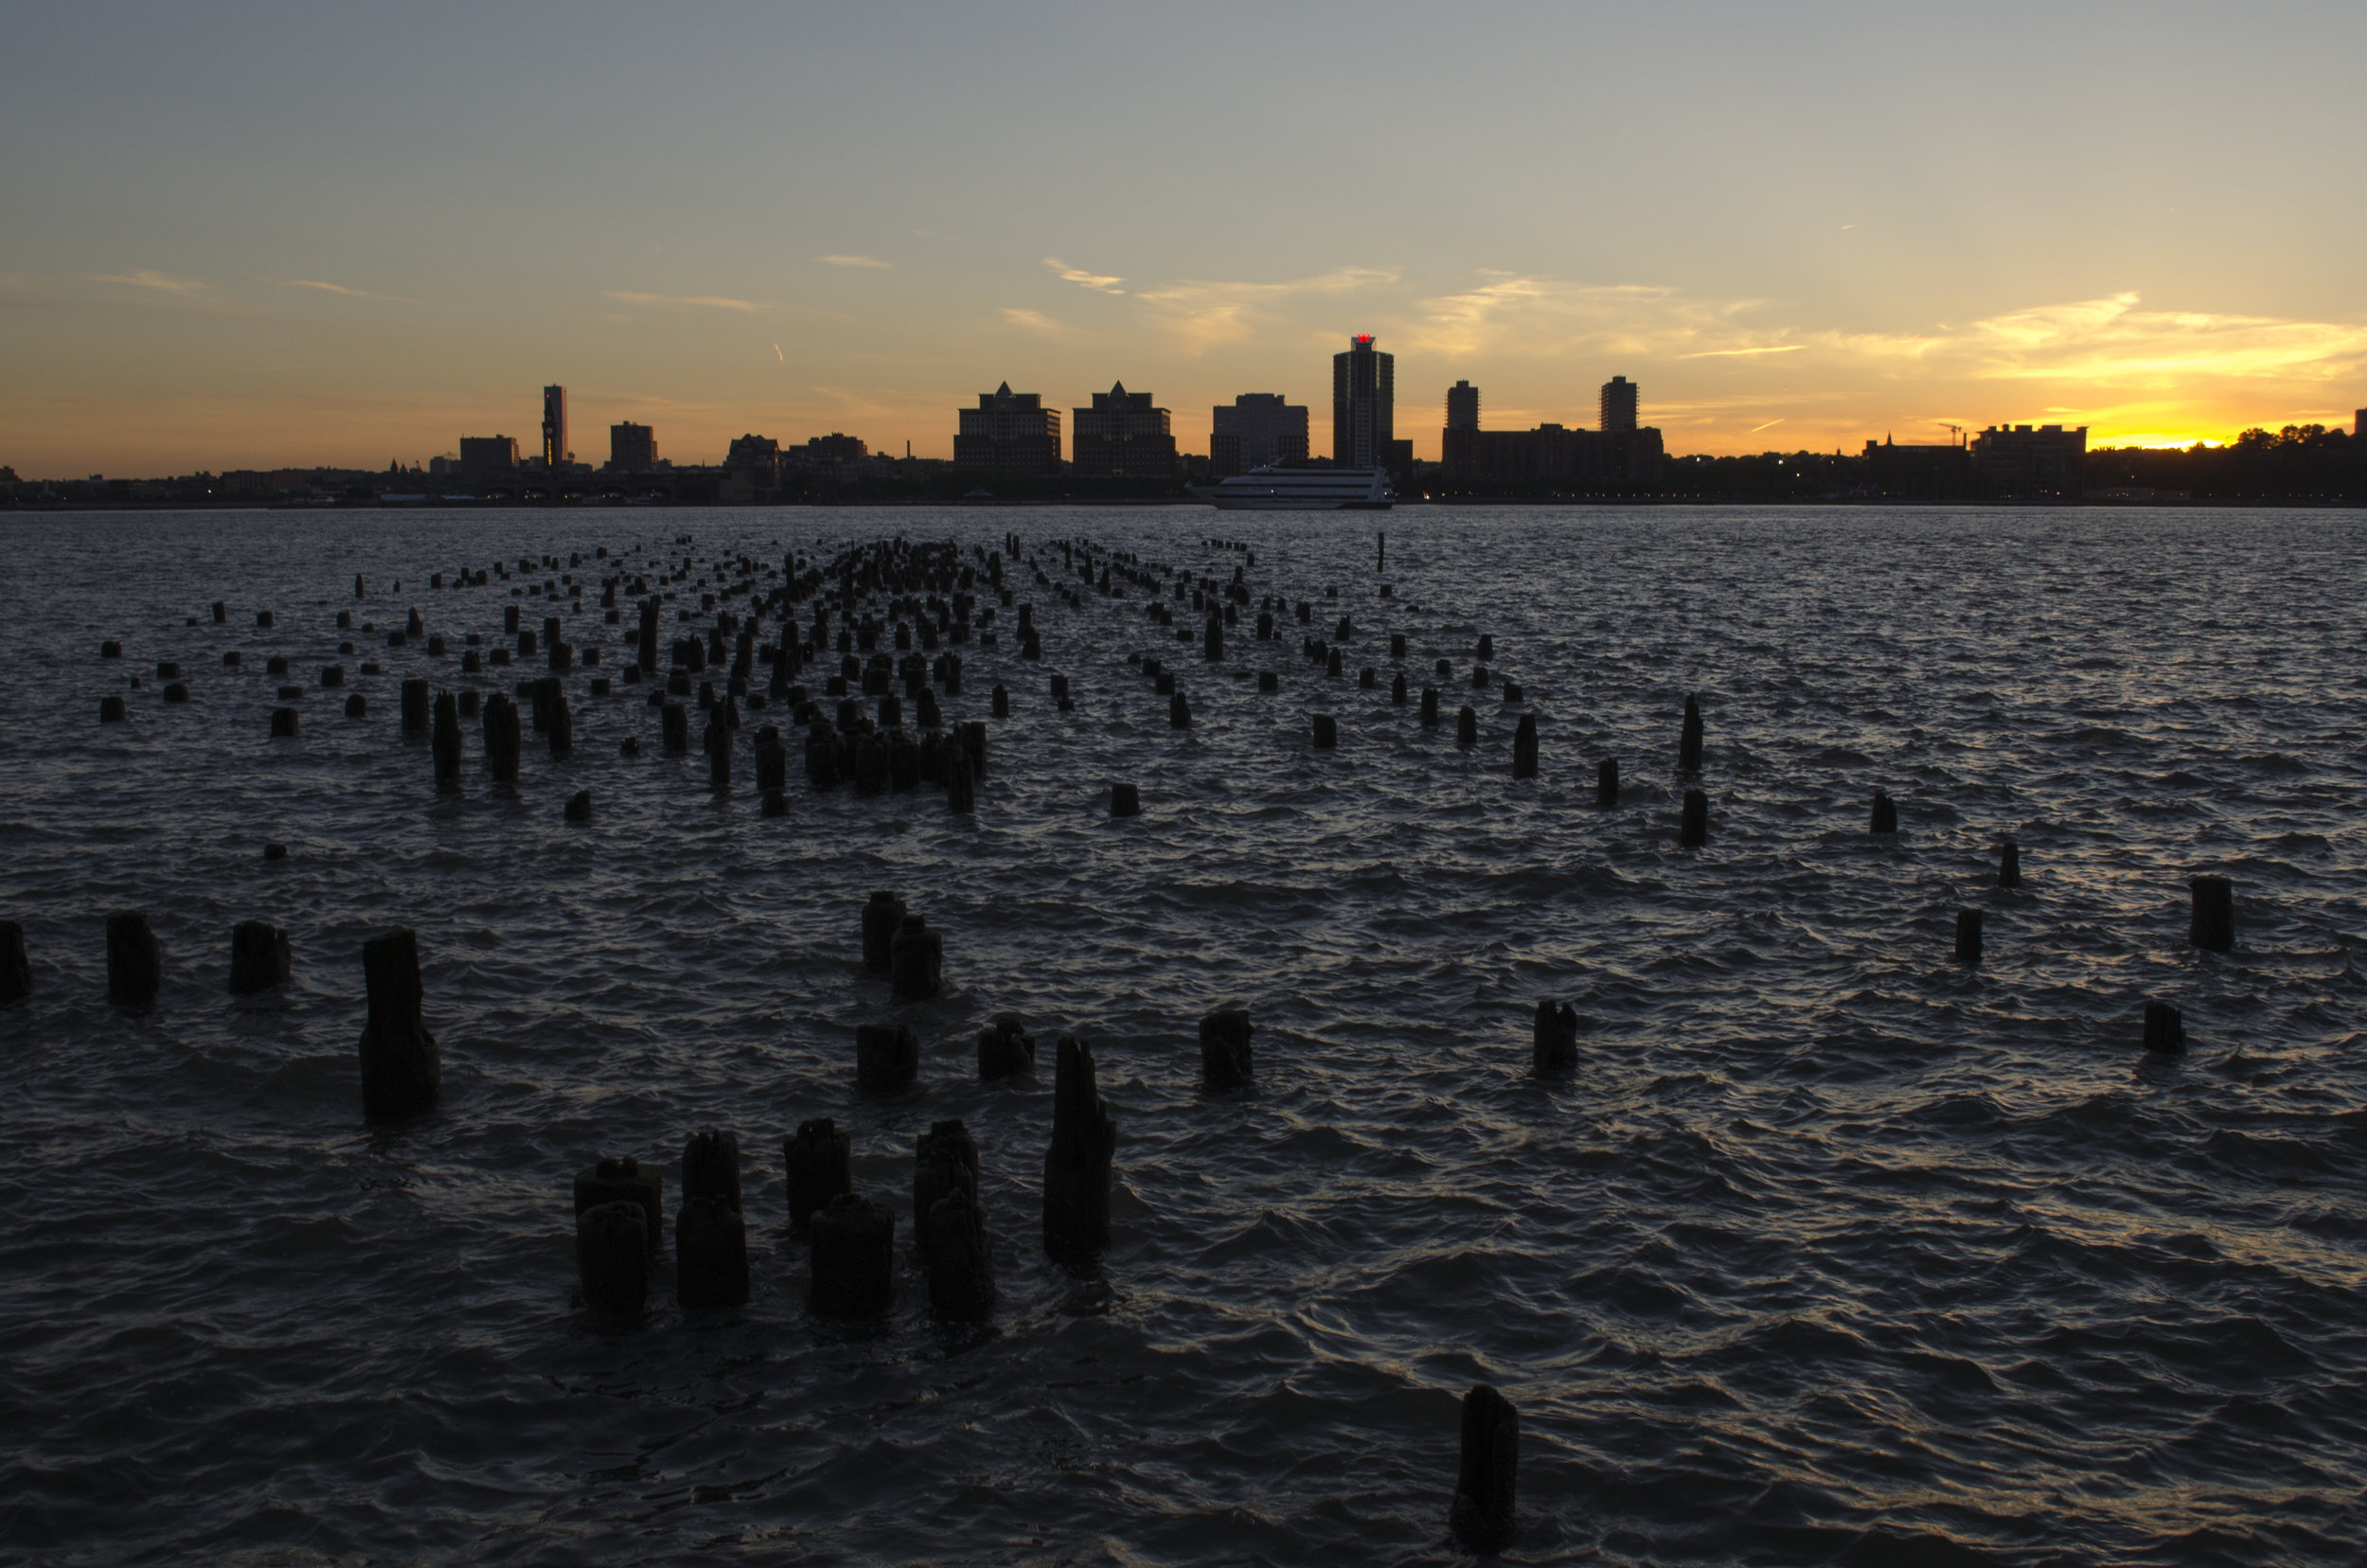 westside-sunset_35102093005_o.jpg